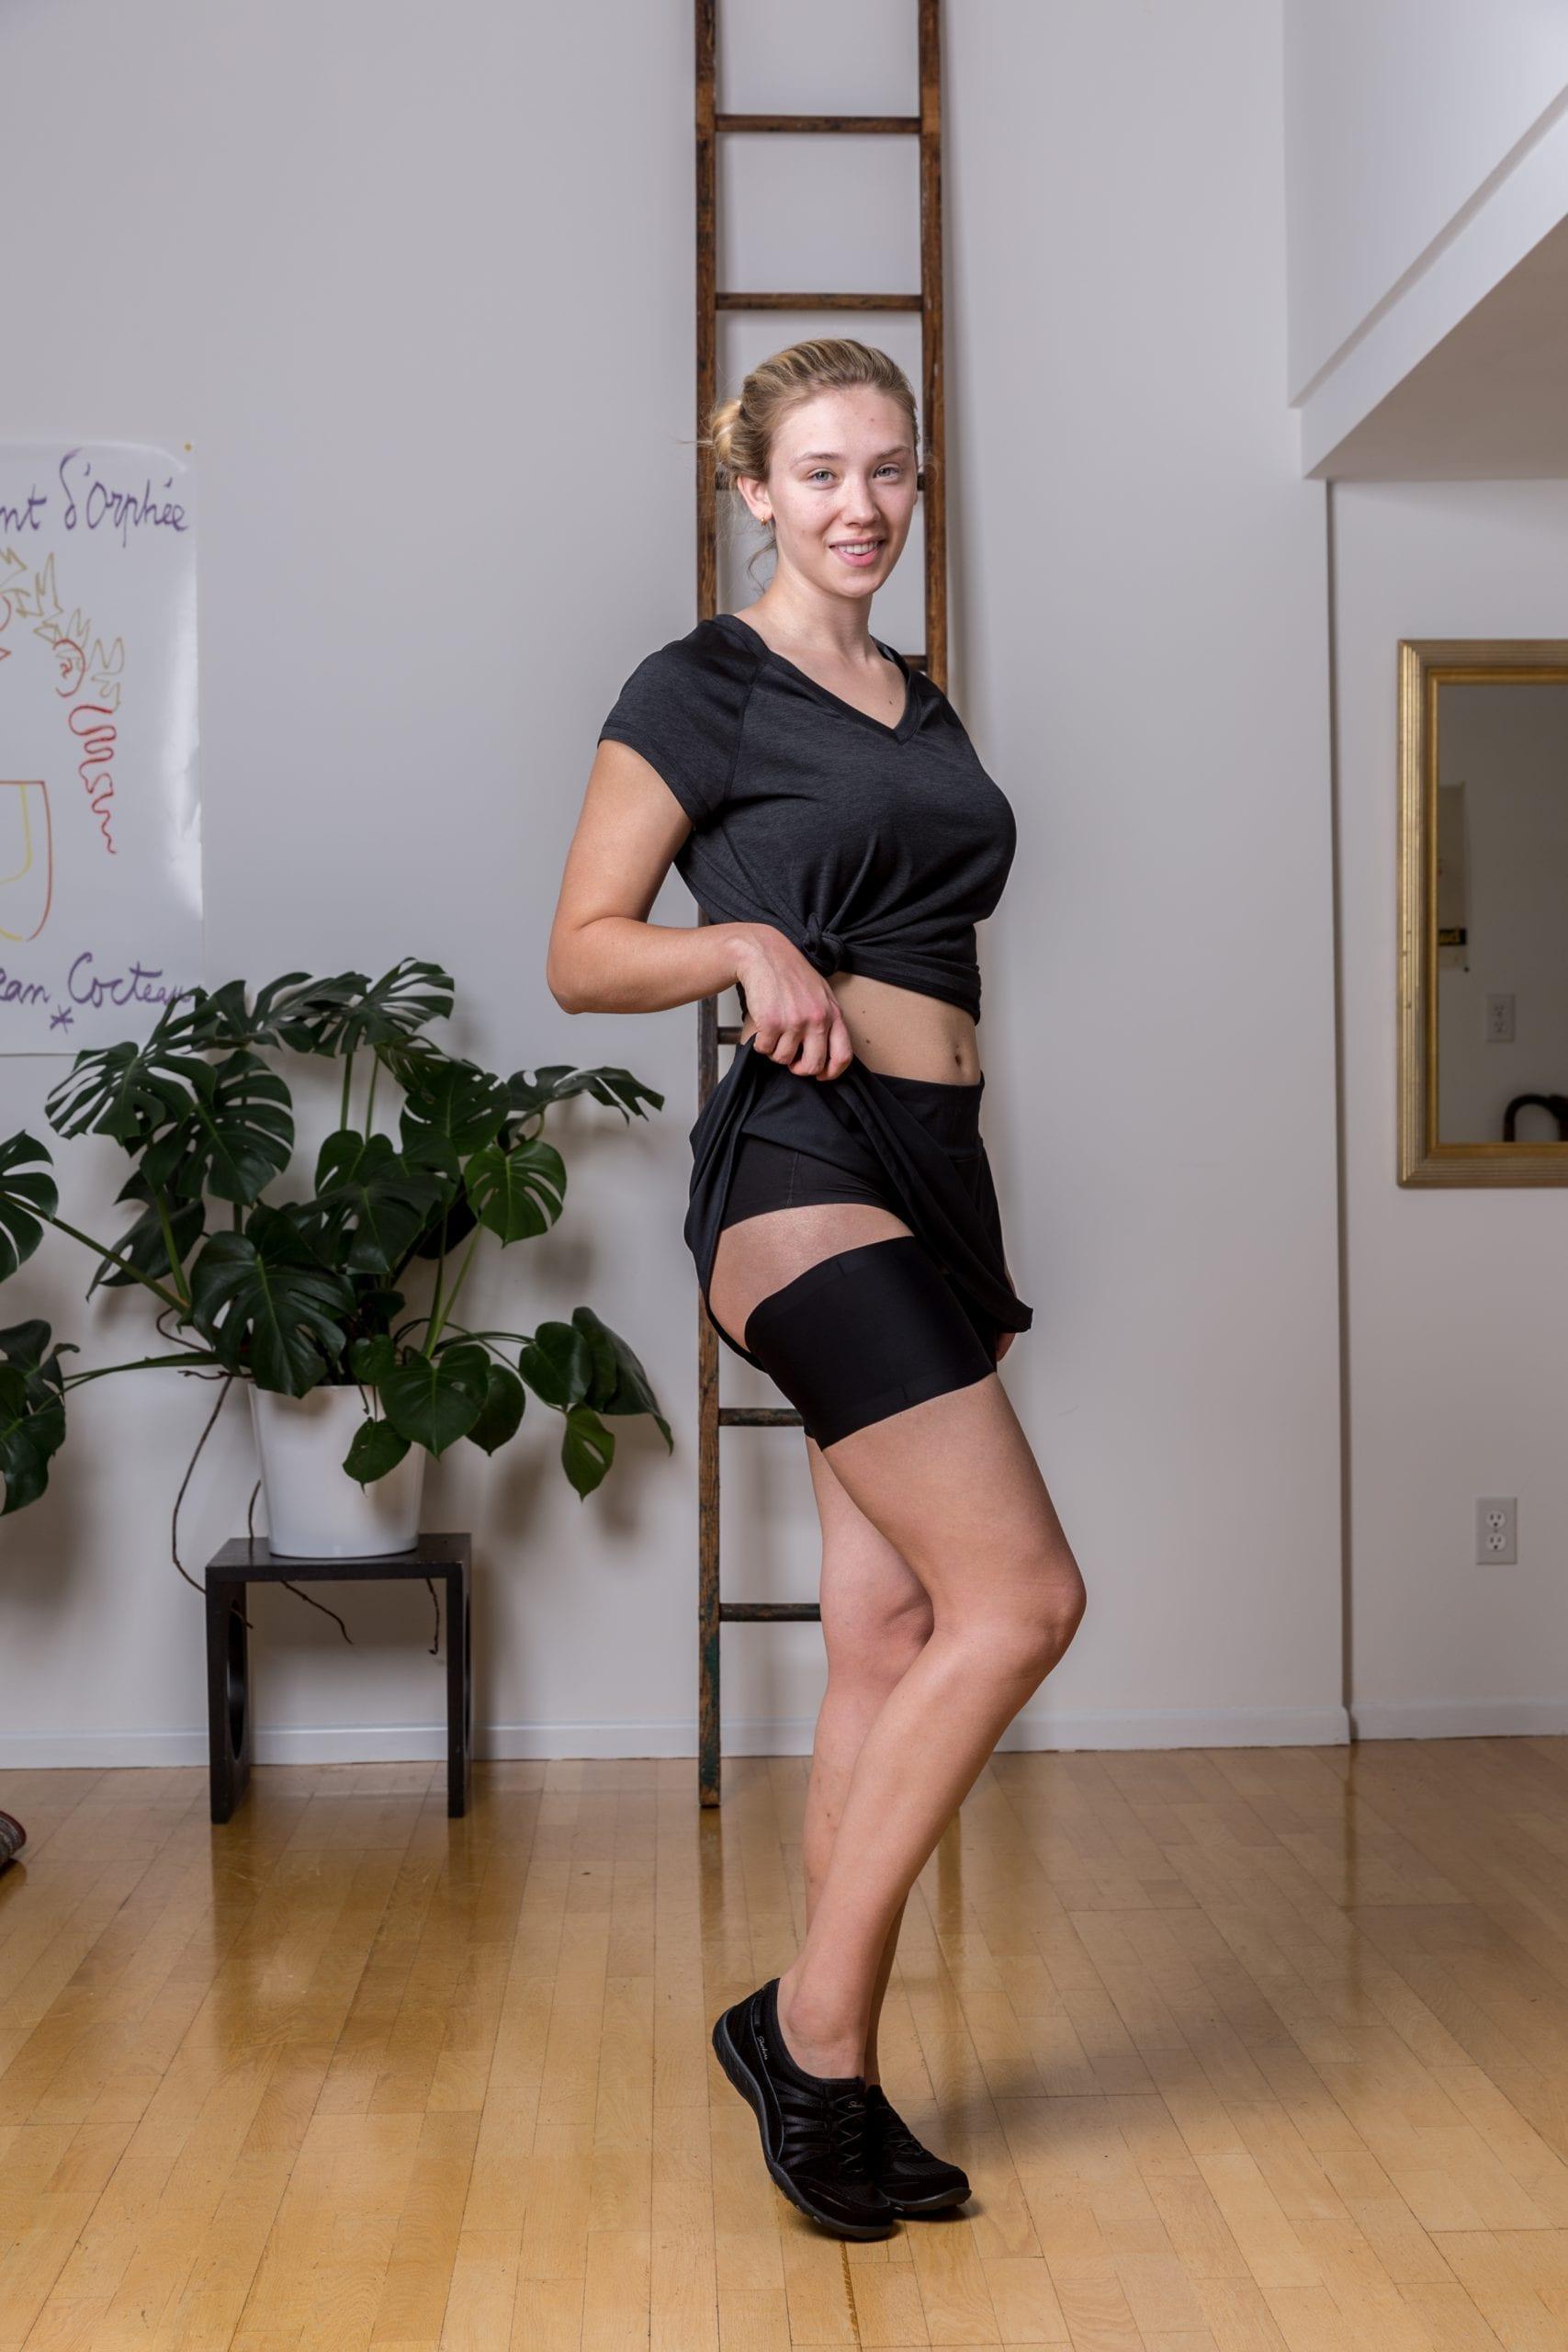 Ultra soft black thigh bands